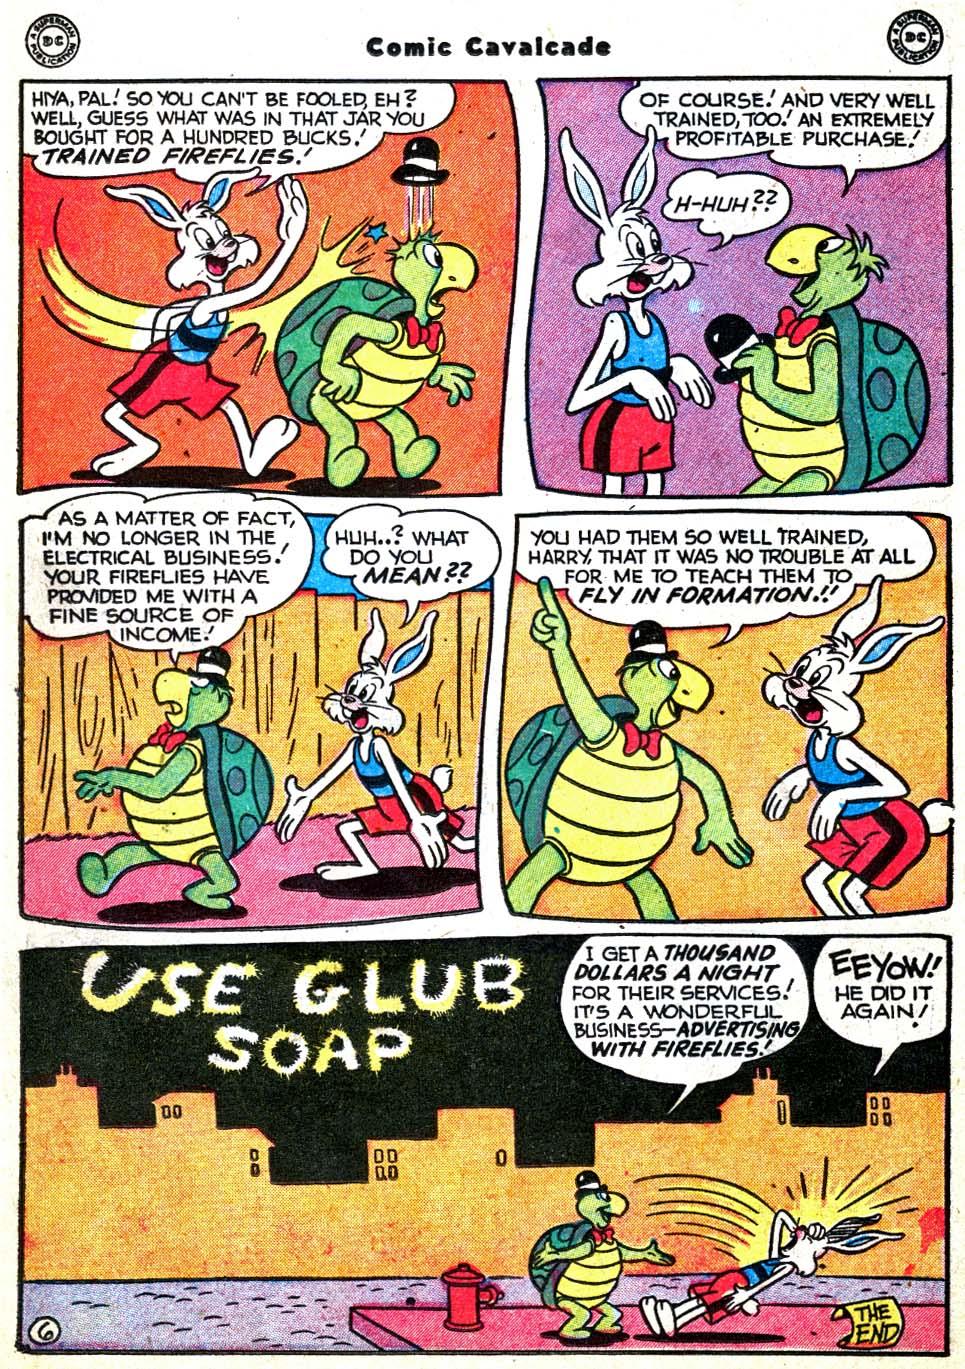 Comic Cavalcade issue 31 - Page 30